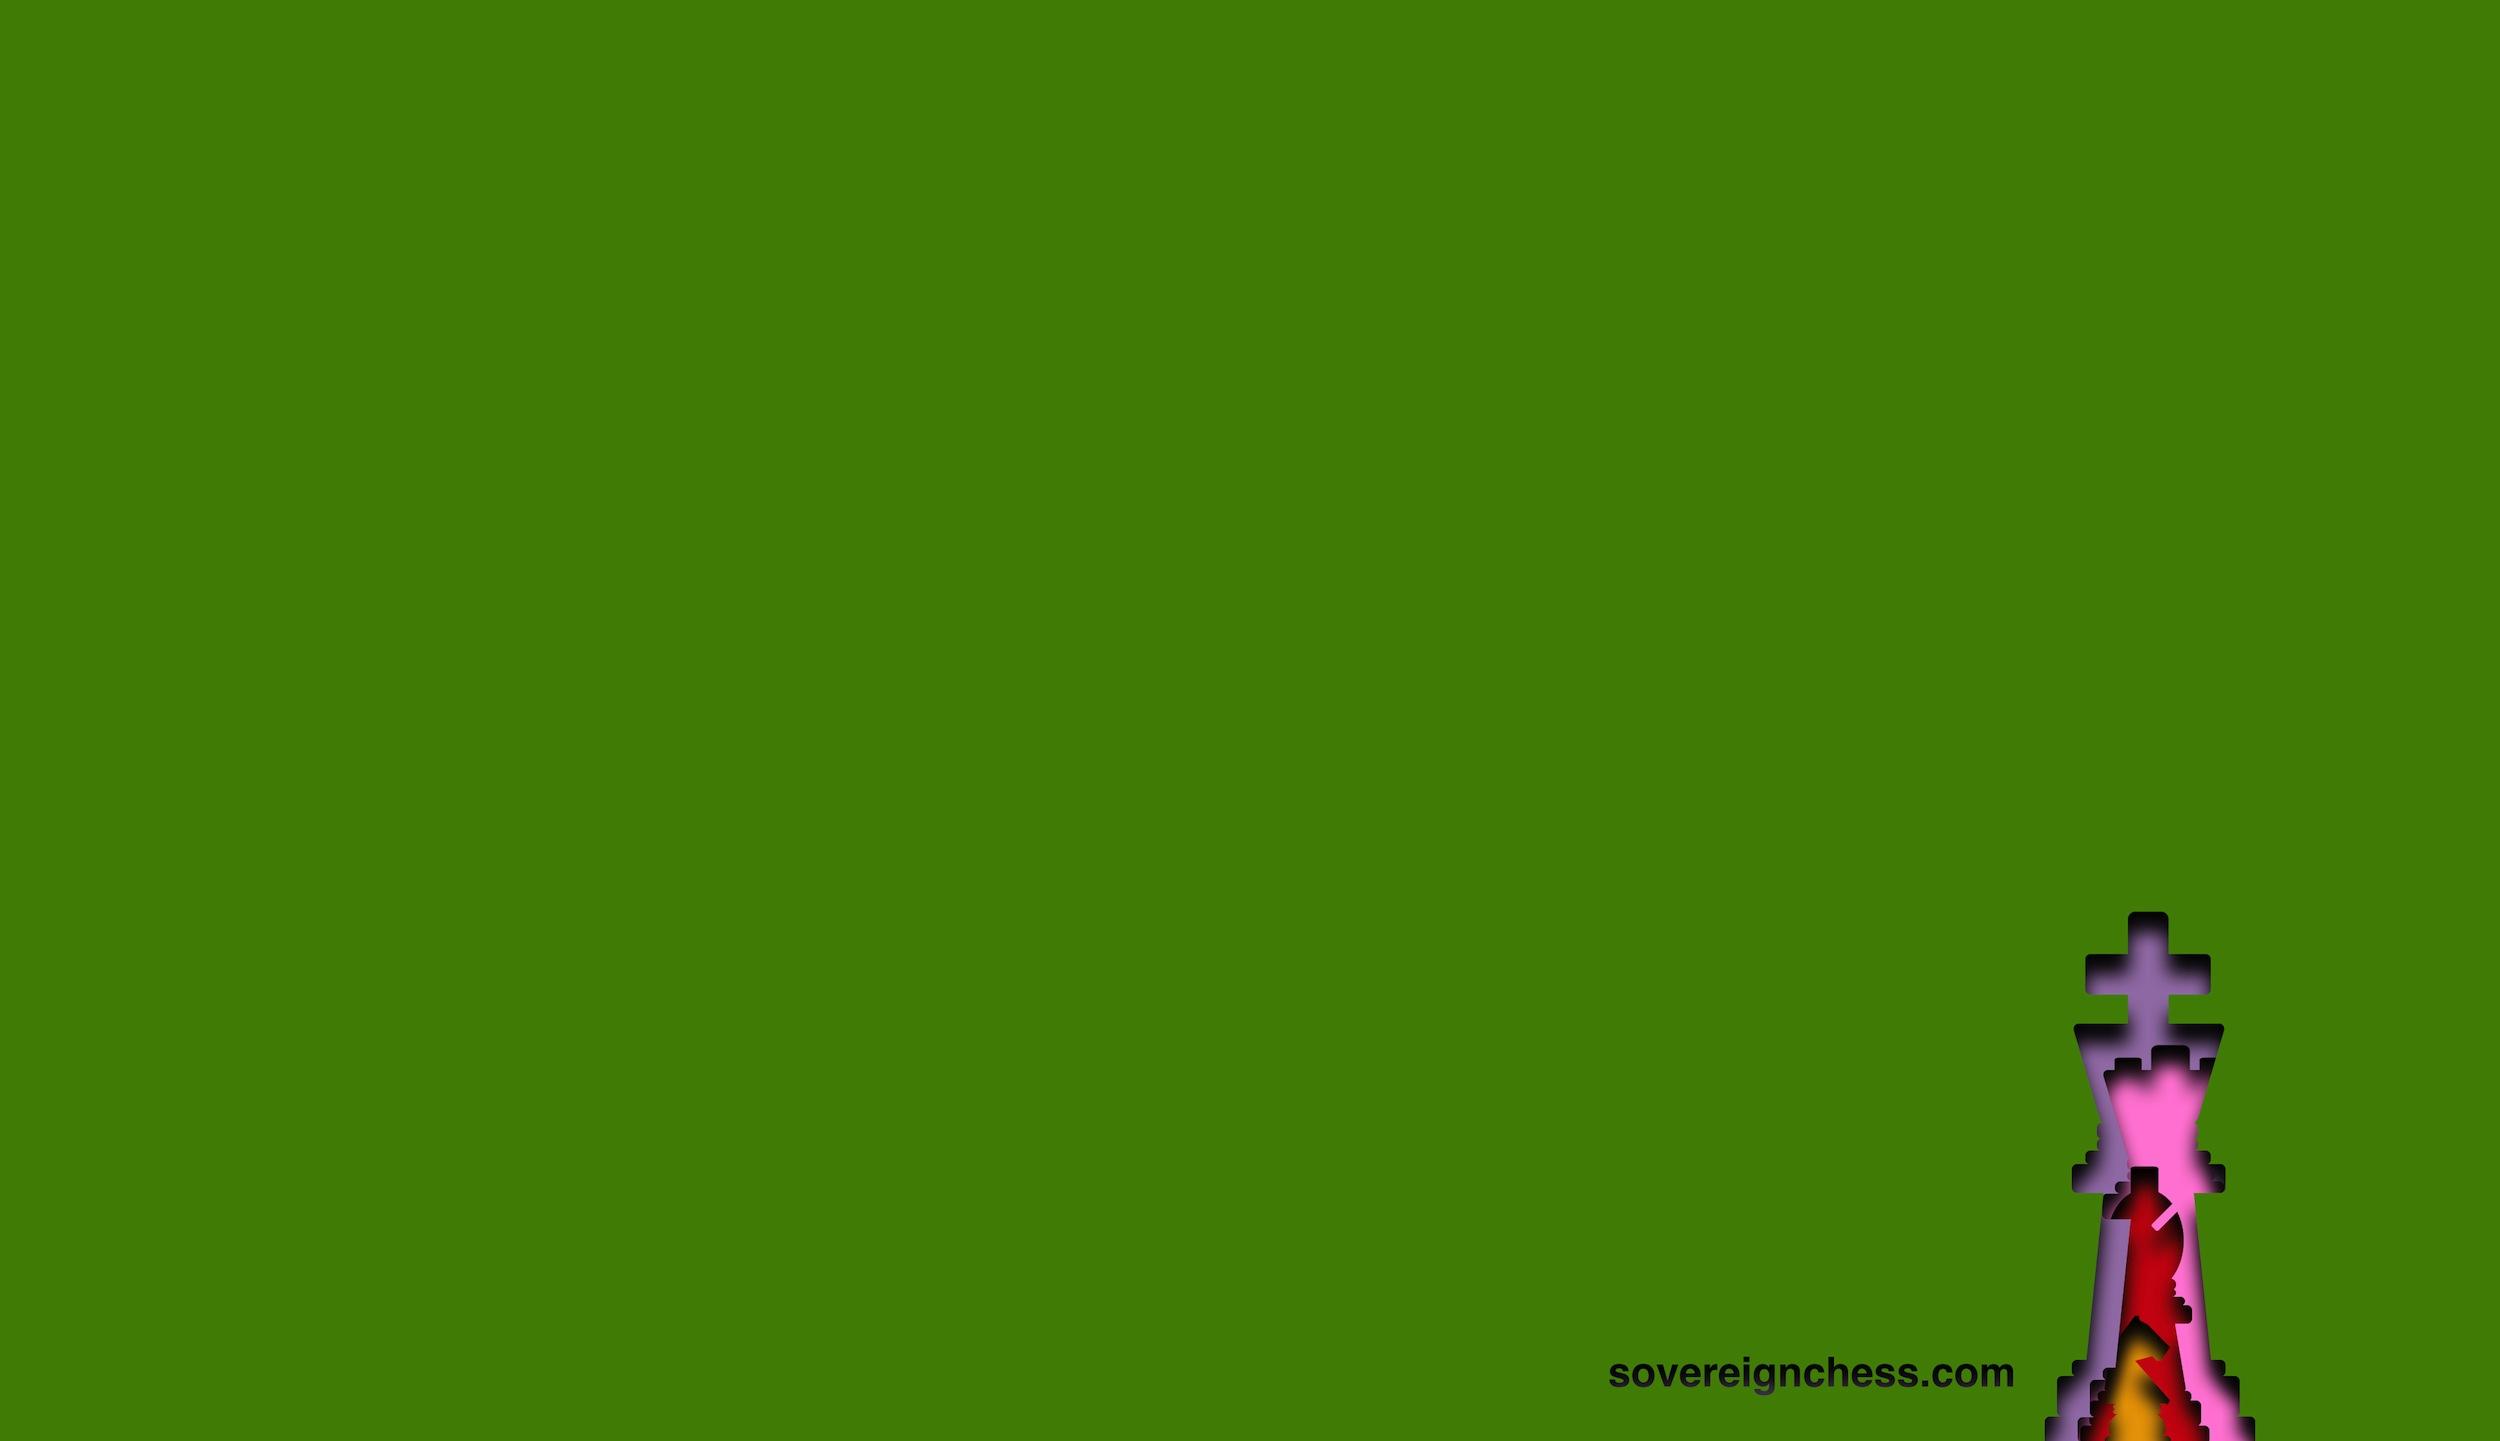 wallpaper_coloredlayers.jpg